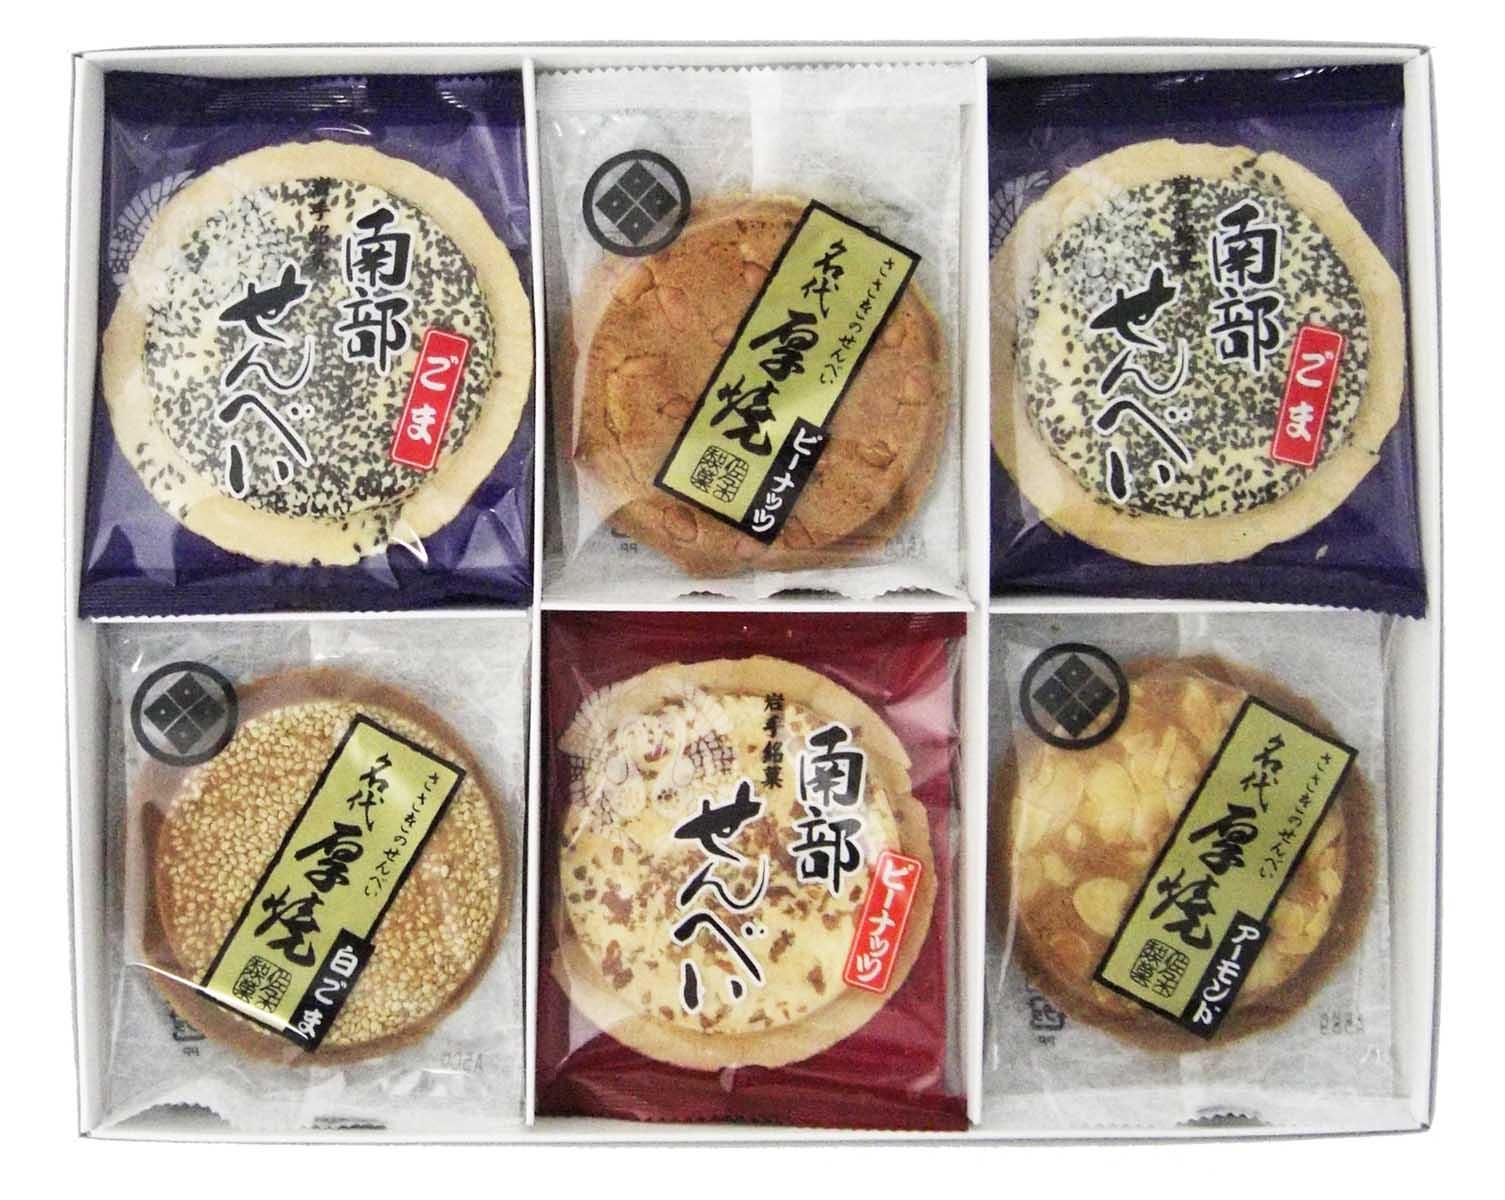 【送料無料】【ネット限定】 厚焼南部詰合せ 【27枚箱入】佐々木製菓